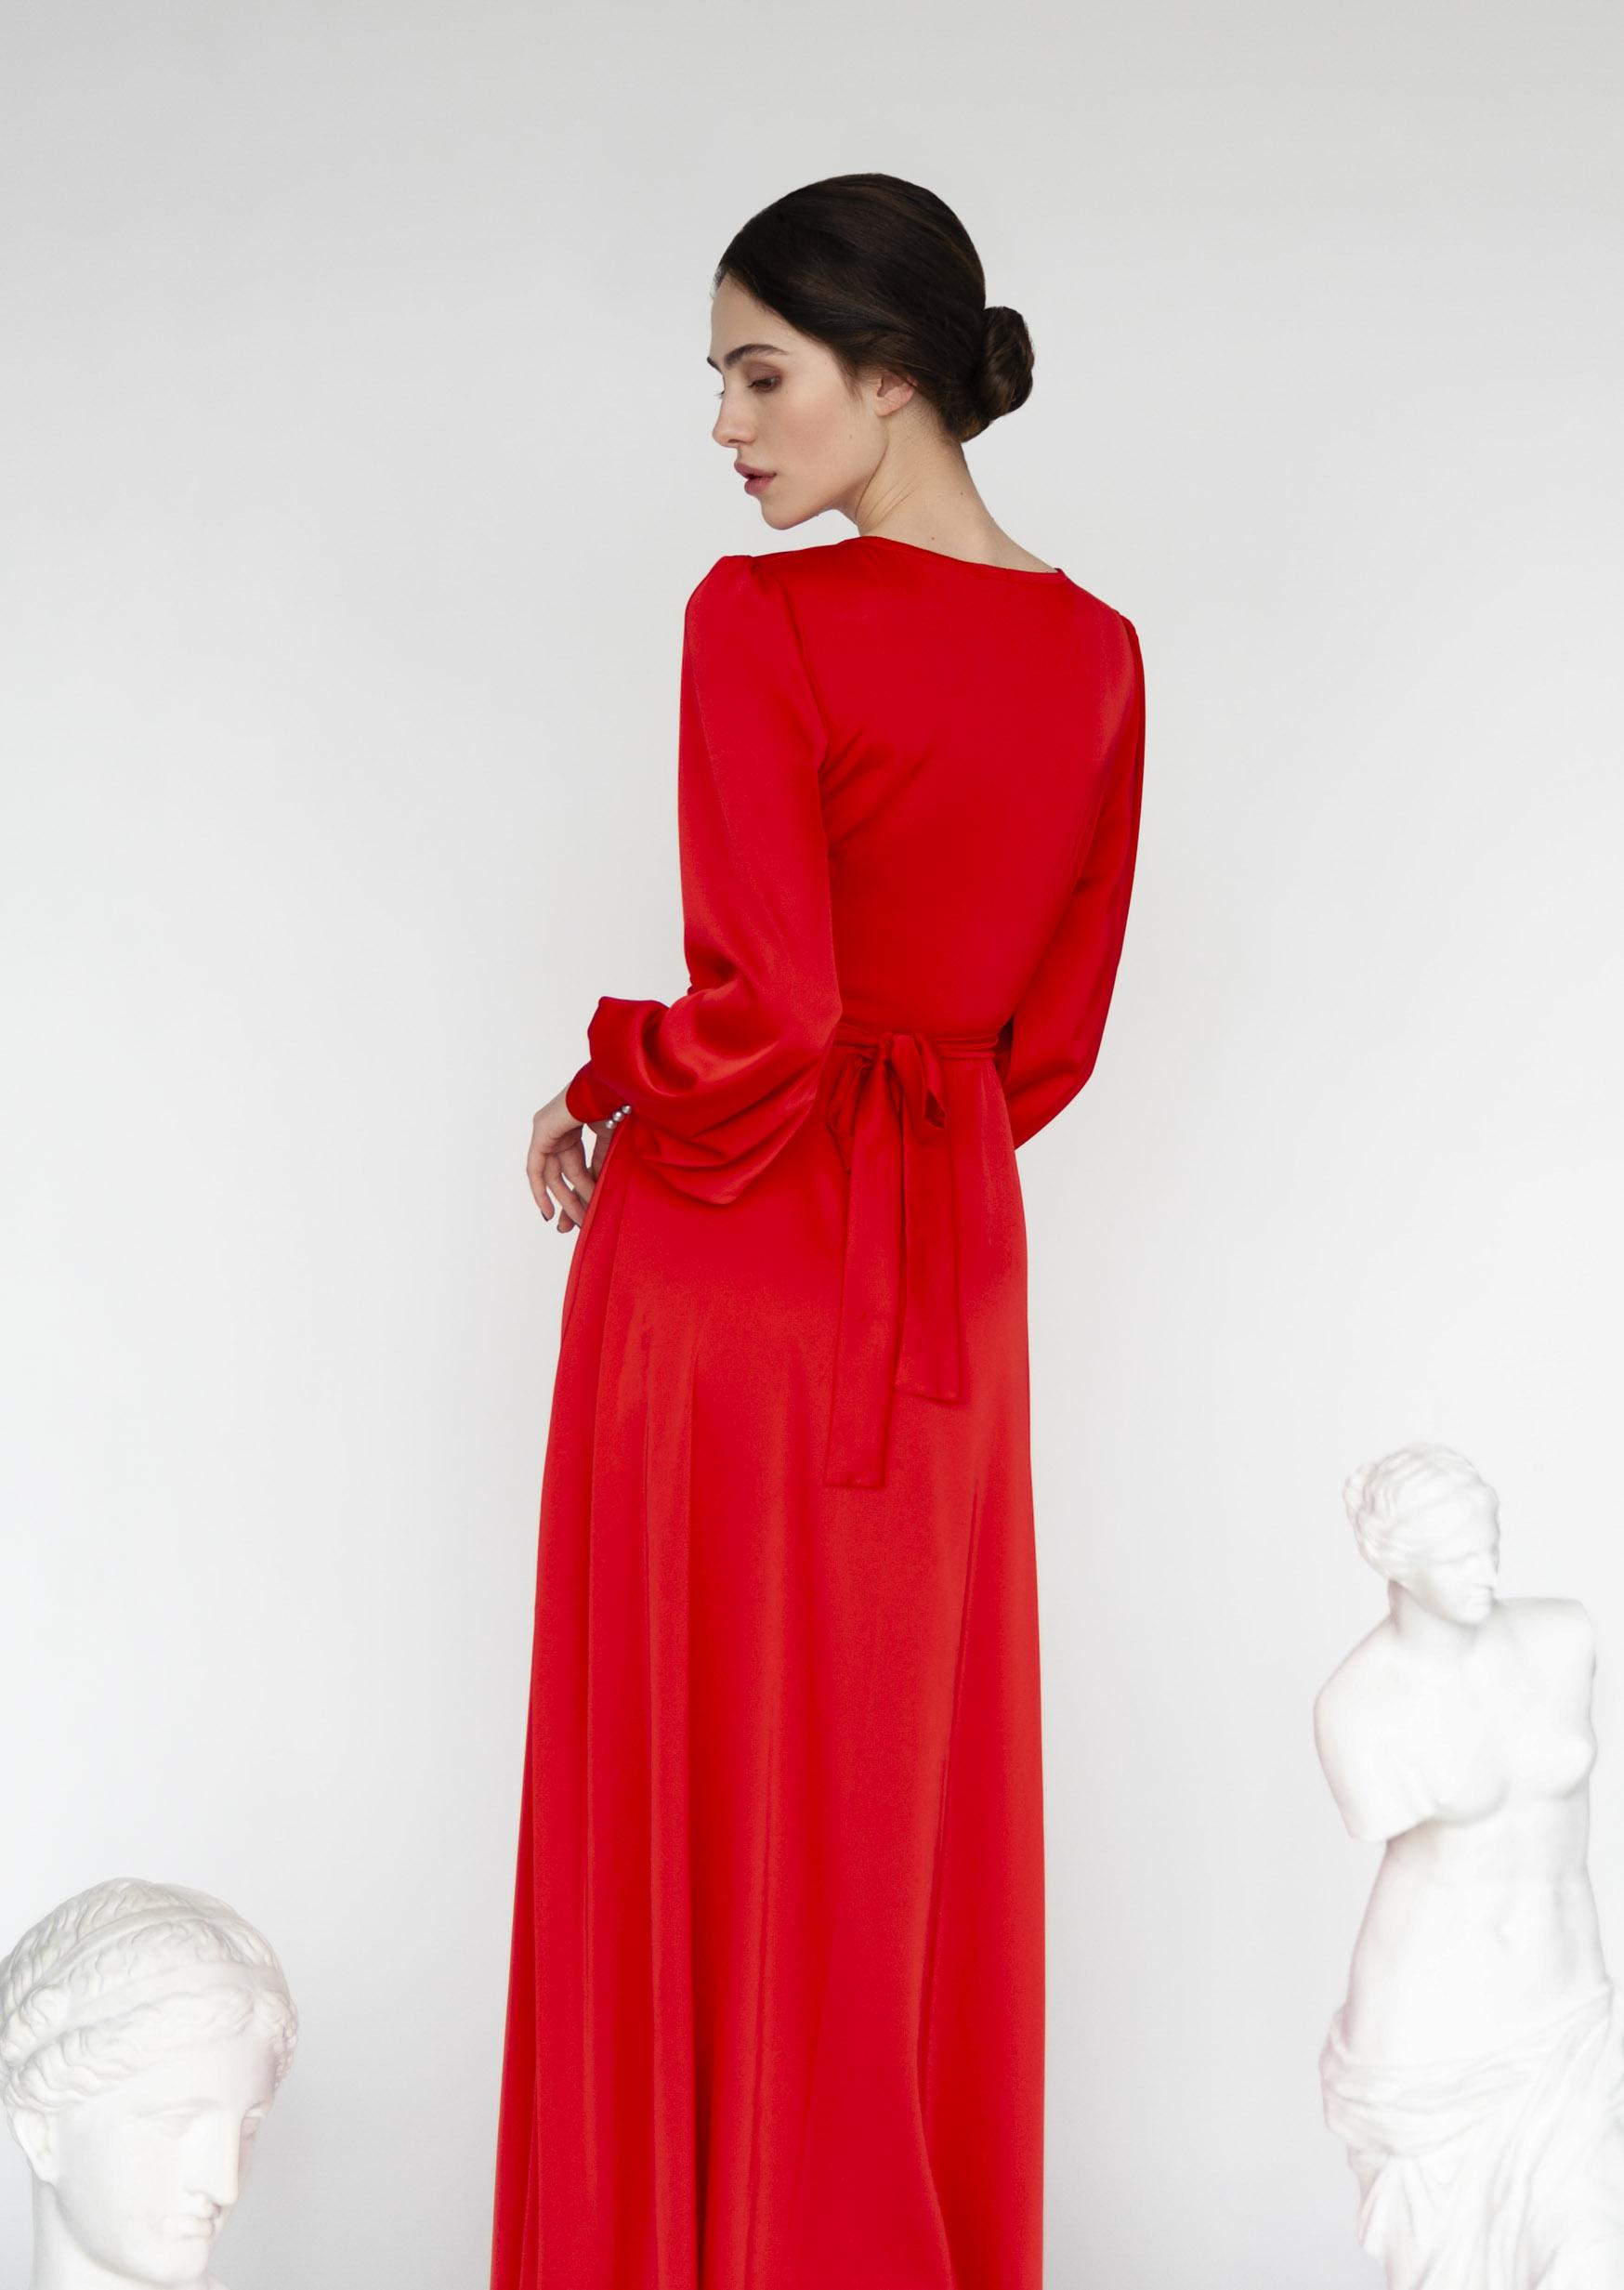 Fire fenix dress red asymmetrical grecian dress with pearl buttons